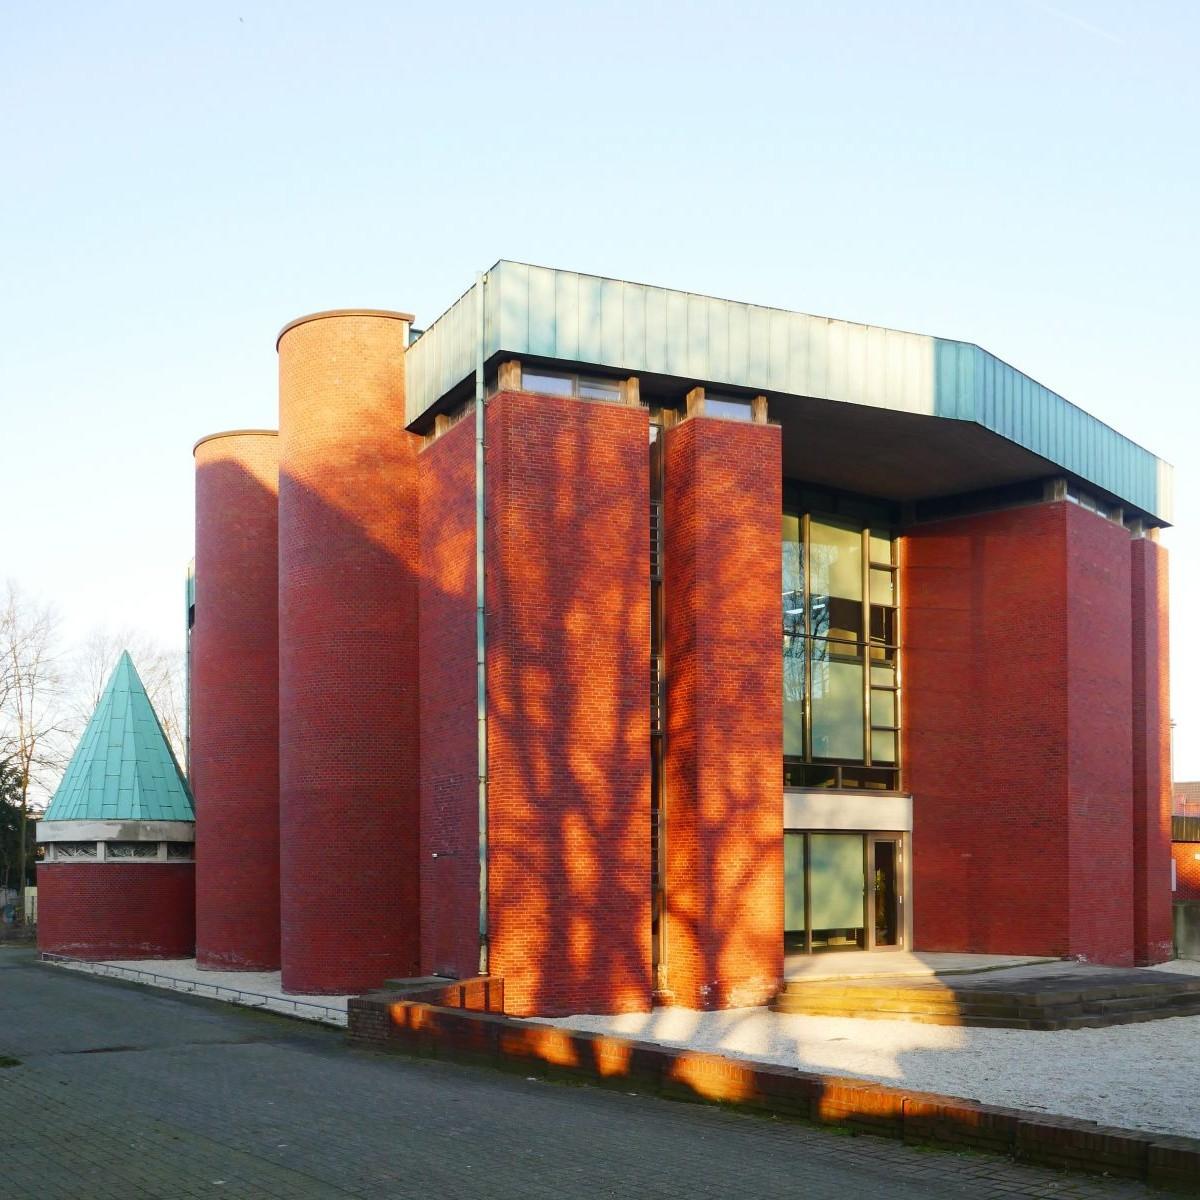 A-Z Architekten: Eberhard M. Kleffner / Christa Kleffner-Dirxen - Bonifatiuskirche Münster (1964/65) - Foto: Stefan Rethfeld